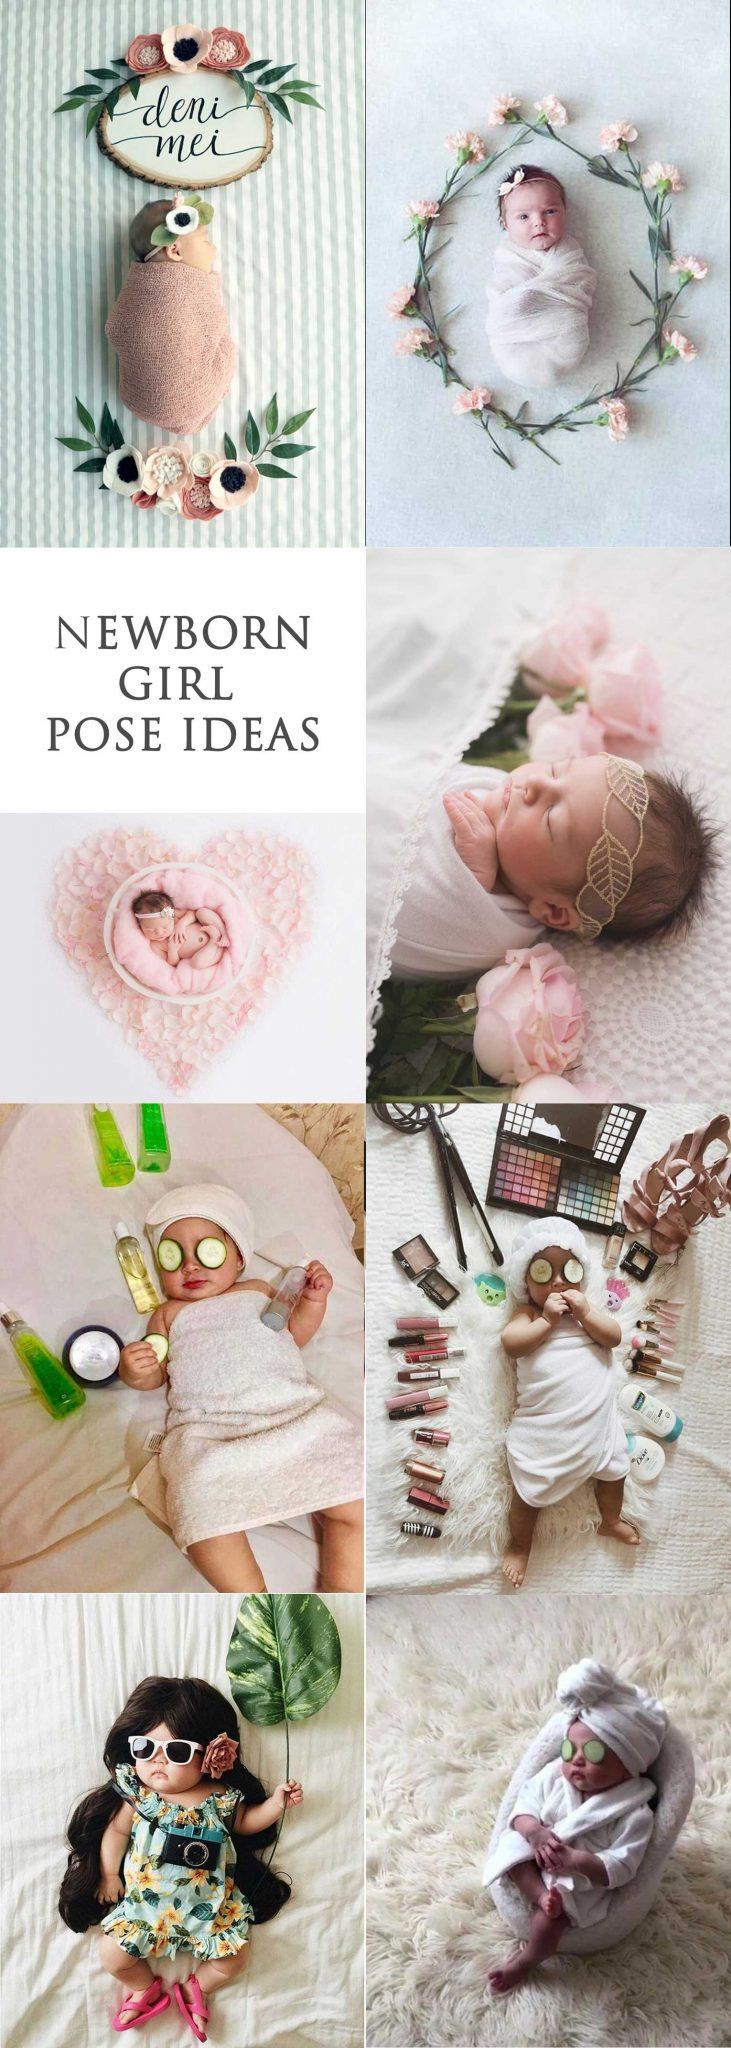 Newborn girl photography